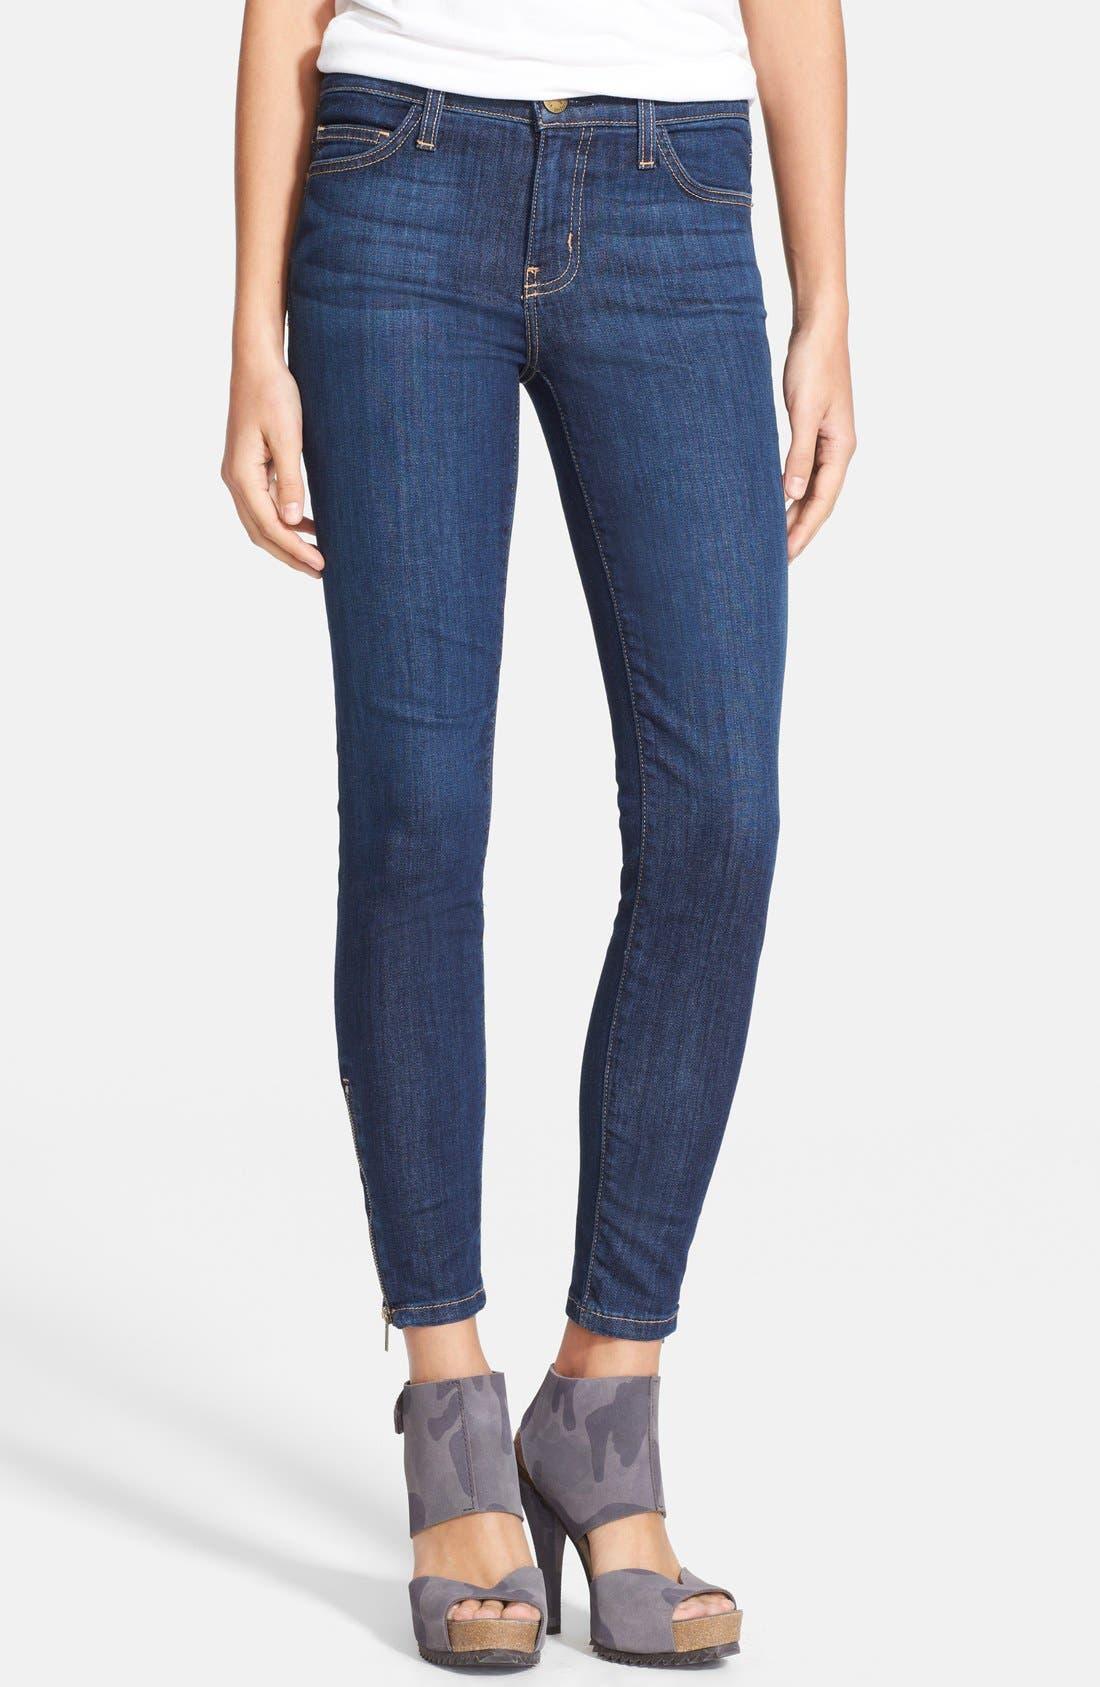 Alternate Image 1 Selected - Current/Elliott 'The Zip Stiletto' Skinny Jeans (Bowler)